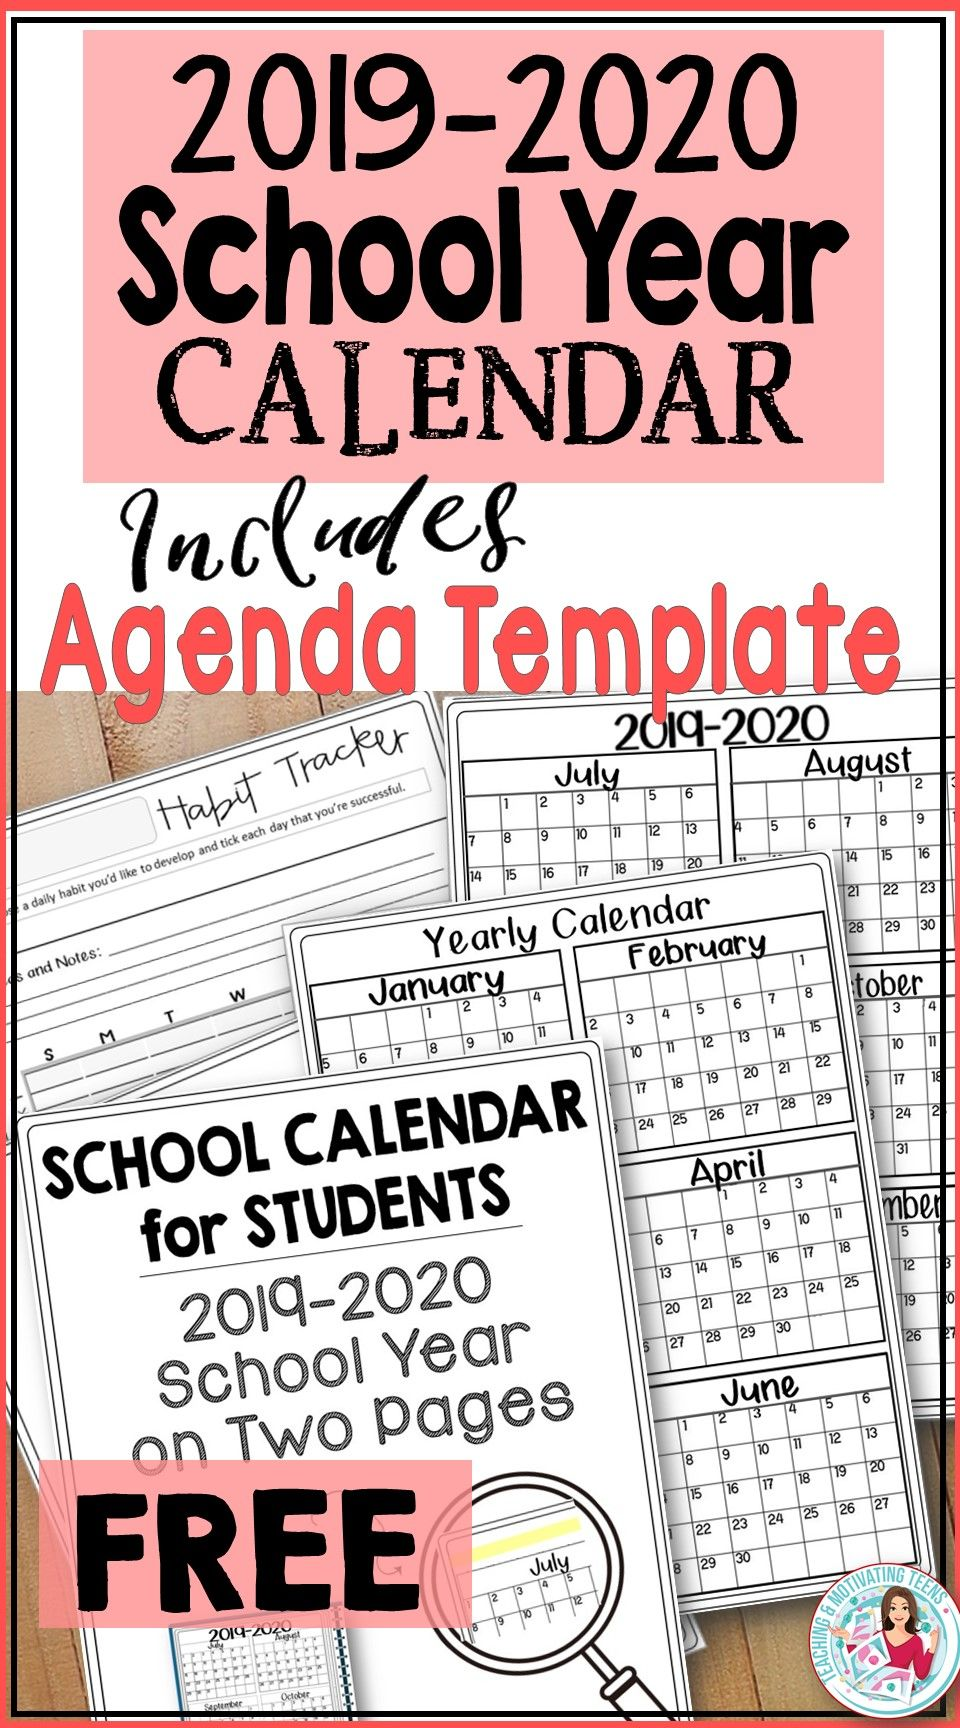 2019-2020 Back-to-School Calendar for Students & Teachers